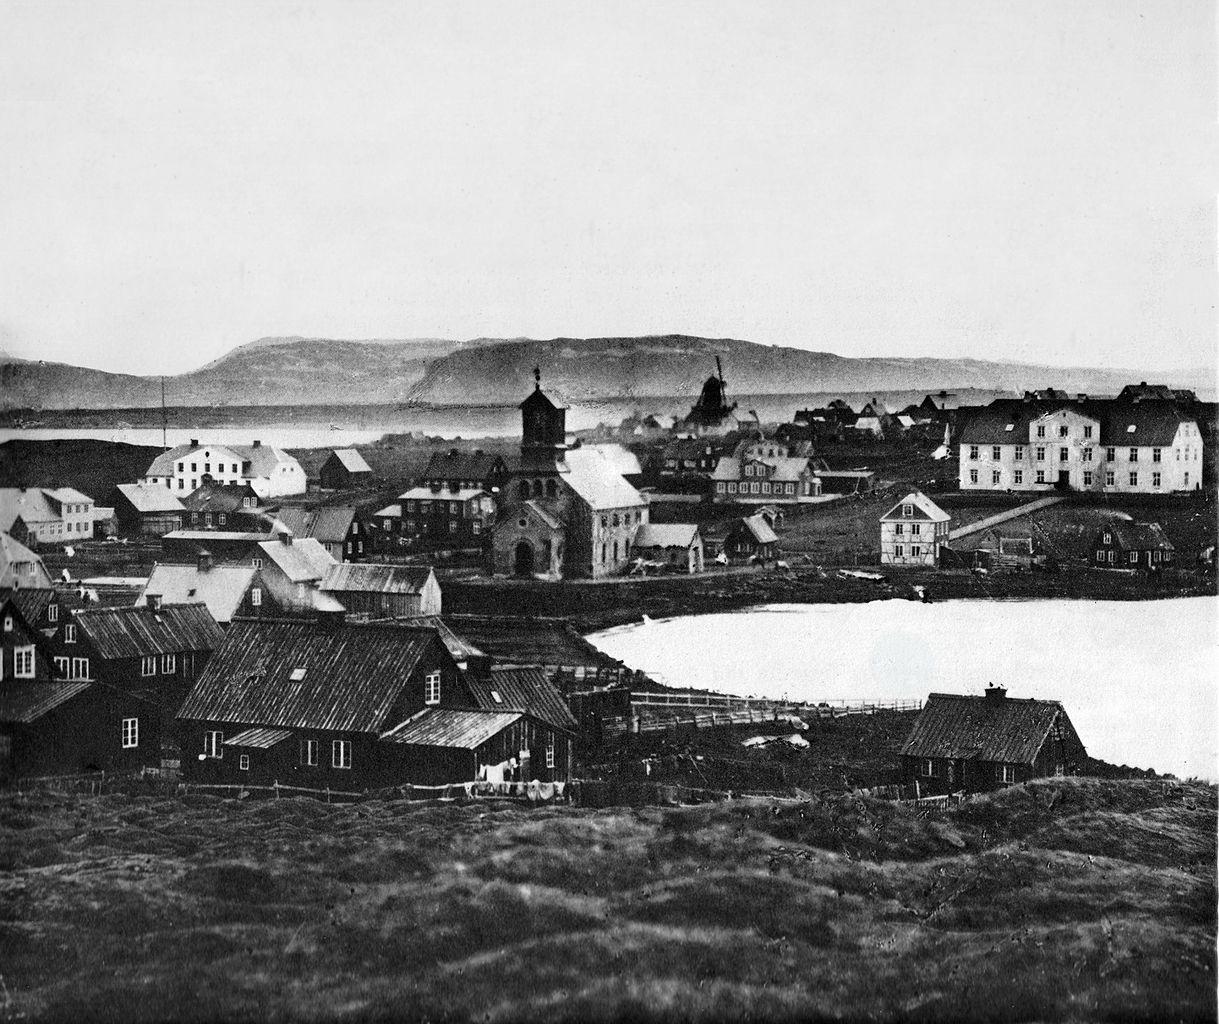 Reykjavik - Photo autor: Sigfús Eymundsson (1837 - 1911)